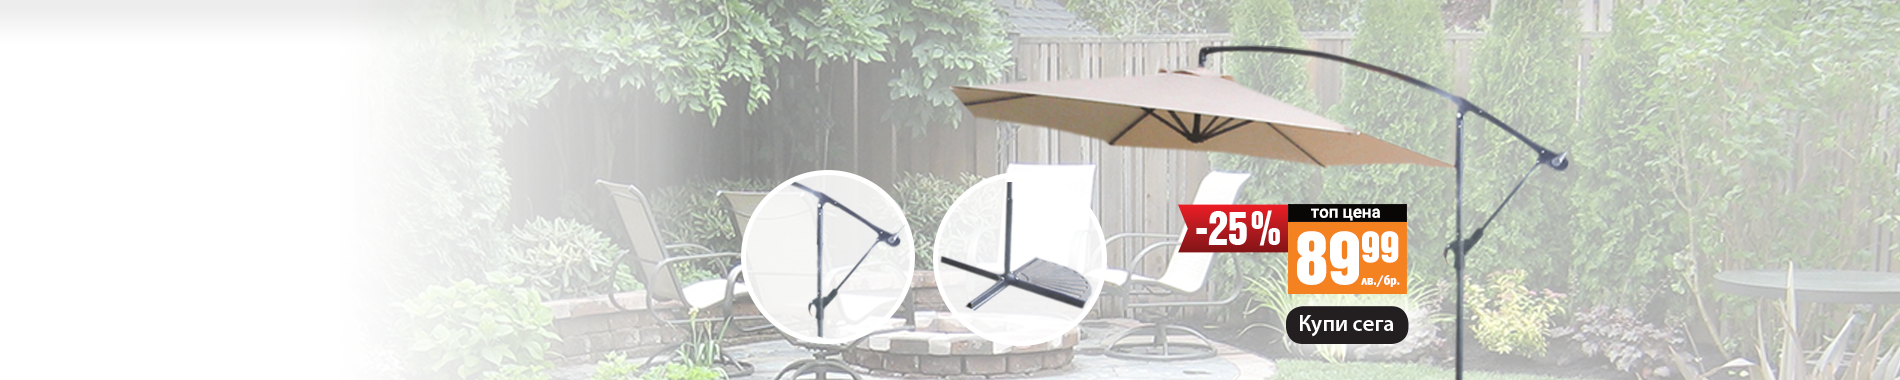 "Градински чадър <br/>""Лале"""